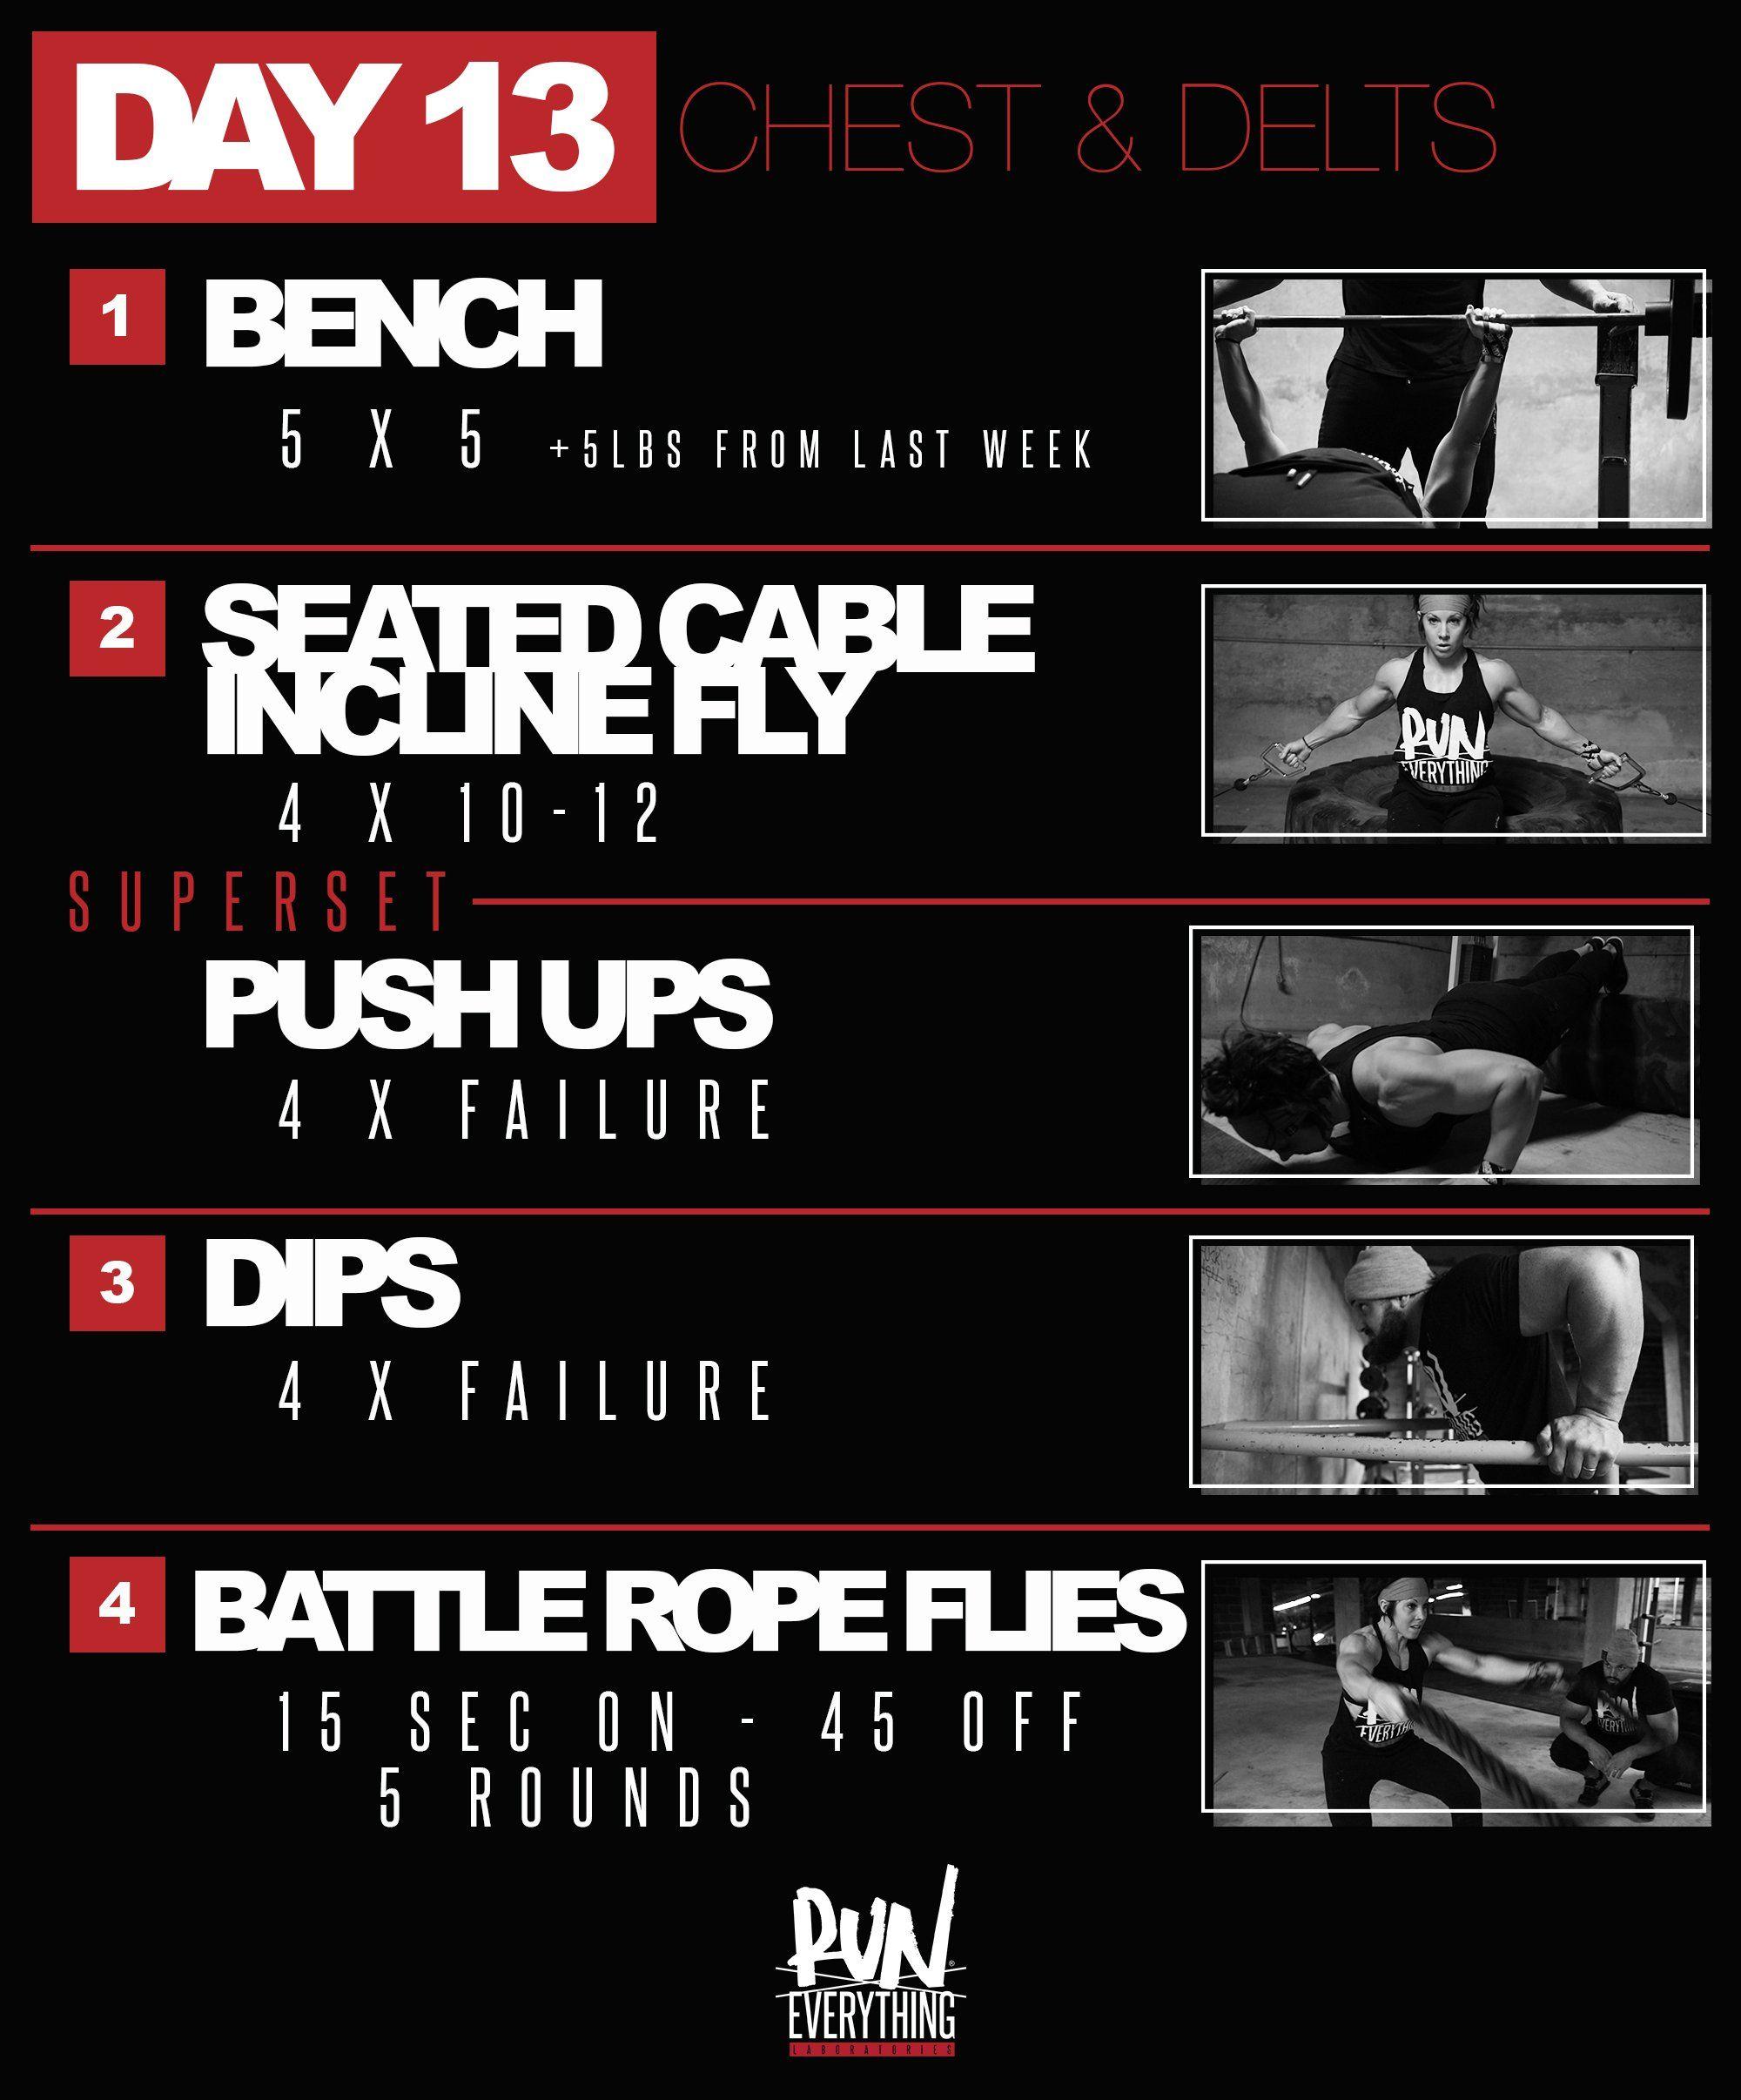 RELPURPOSE | up in the gym | Dana linn bailey, Fit board